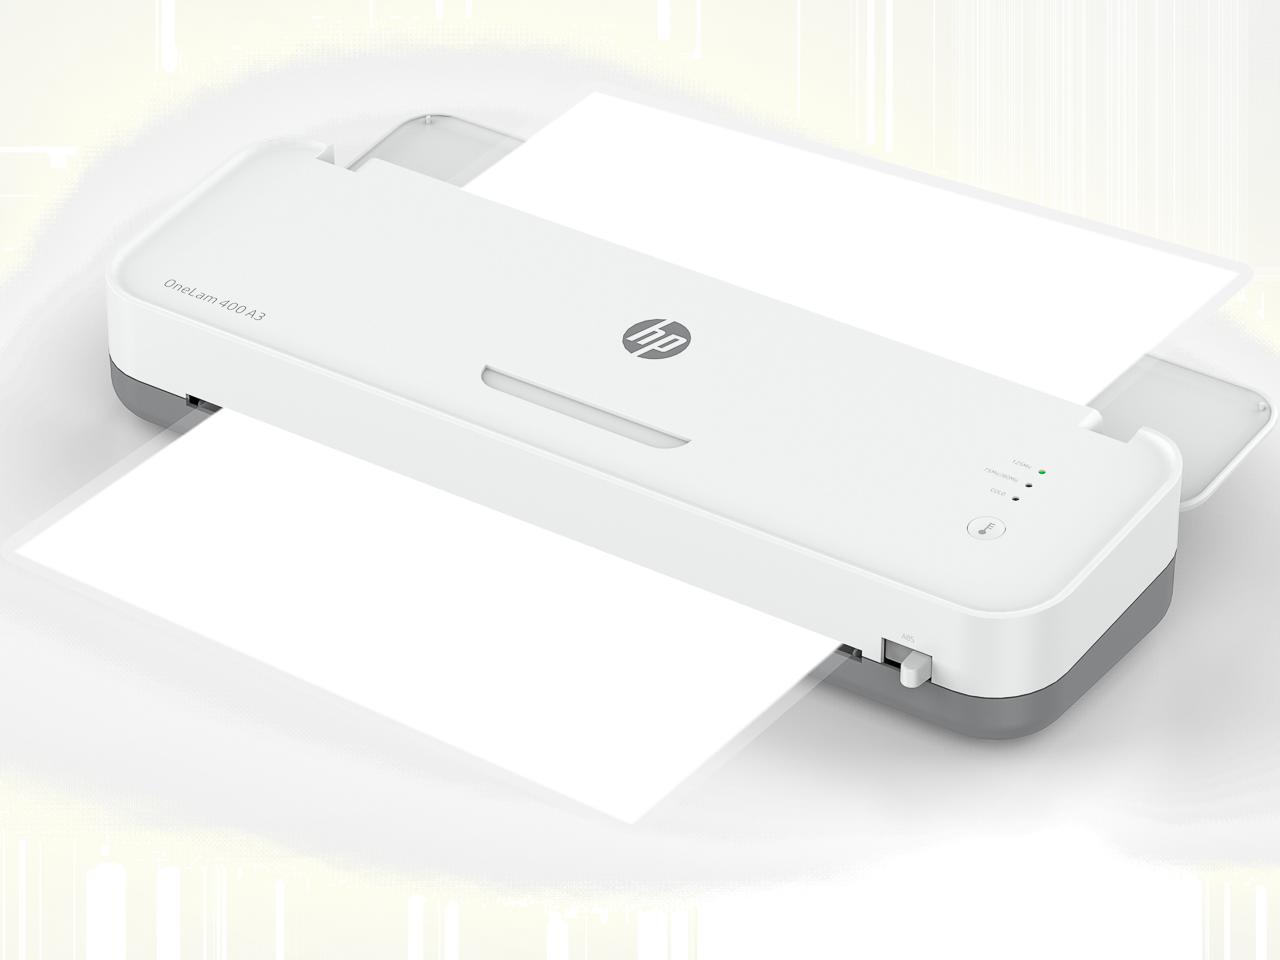 HP LAMINATOR ONELAM400 A3 3161 75-125µ white 1